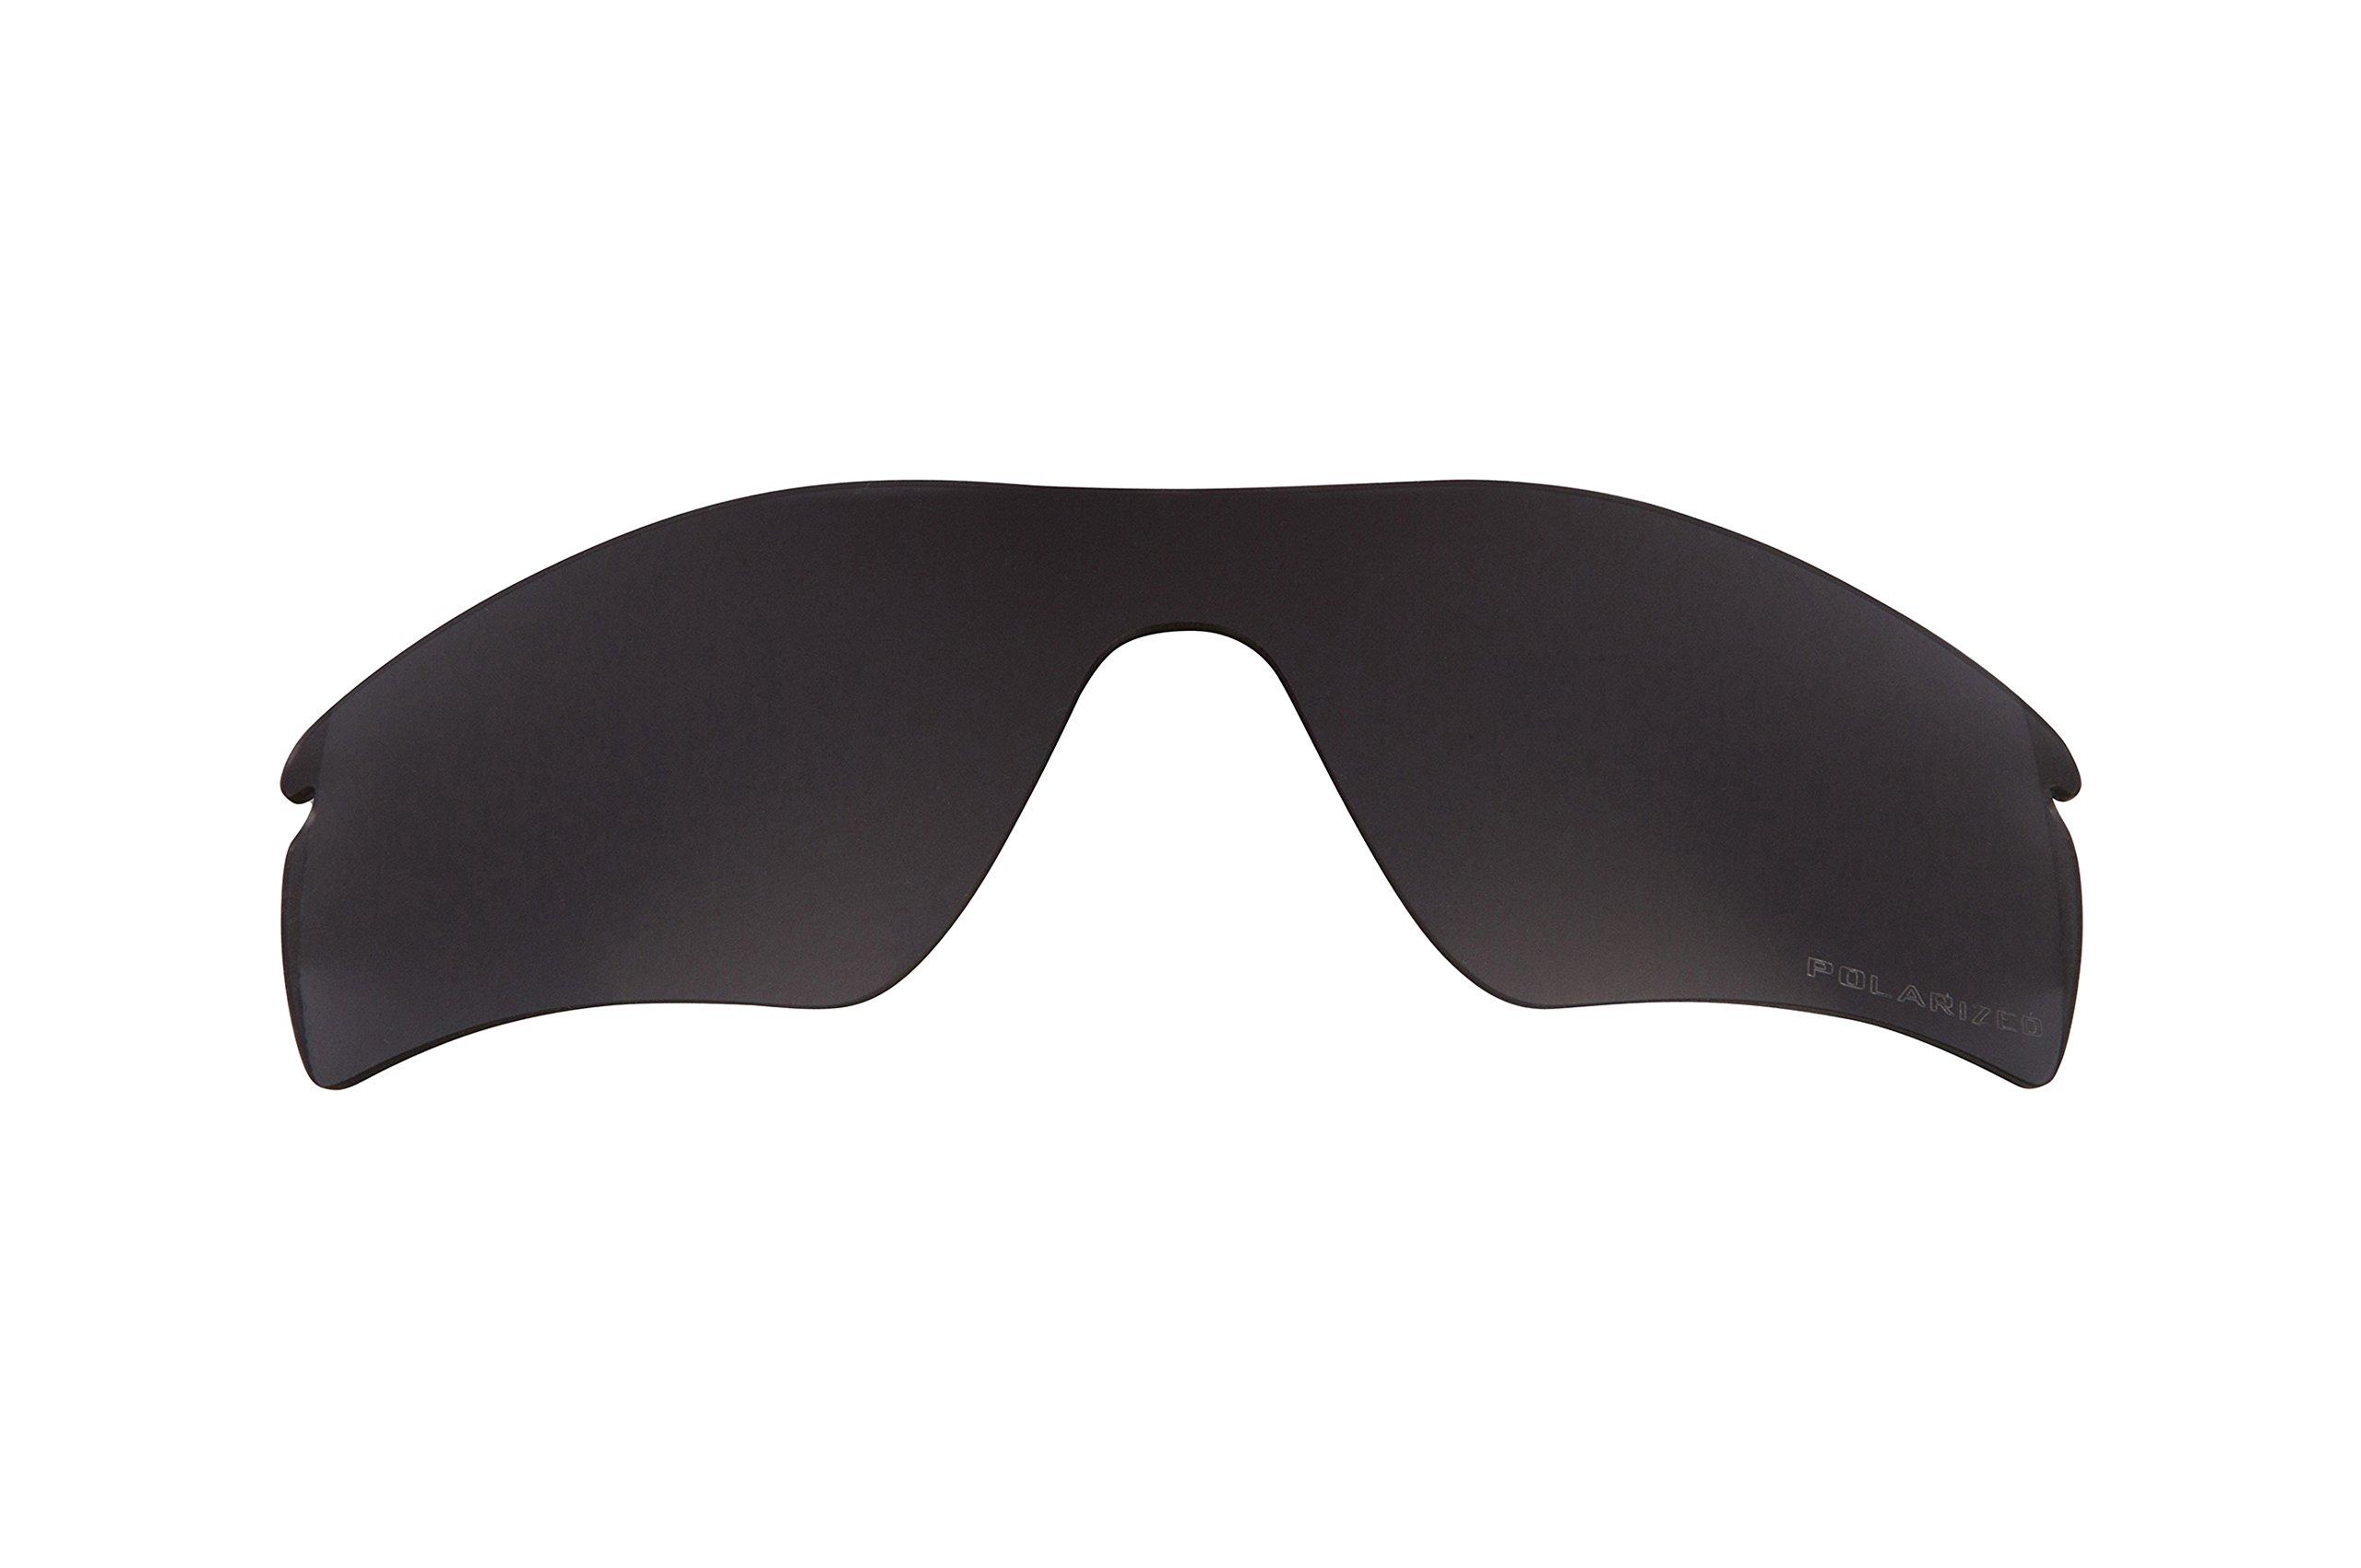 New SEEK OPTICS Replacement Lenses Oakley RADAR PATH - Polarized Black